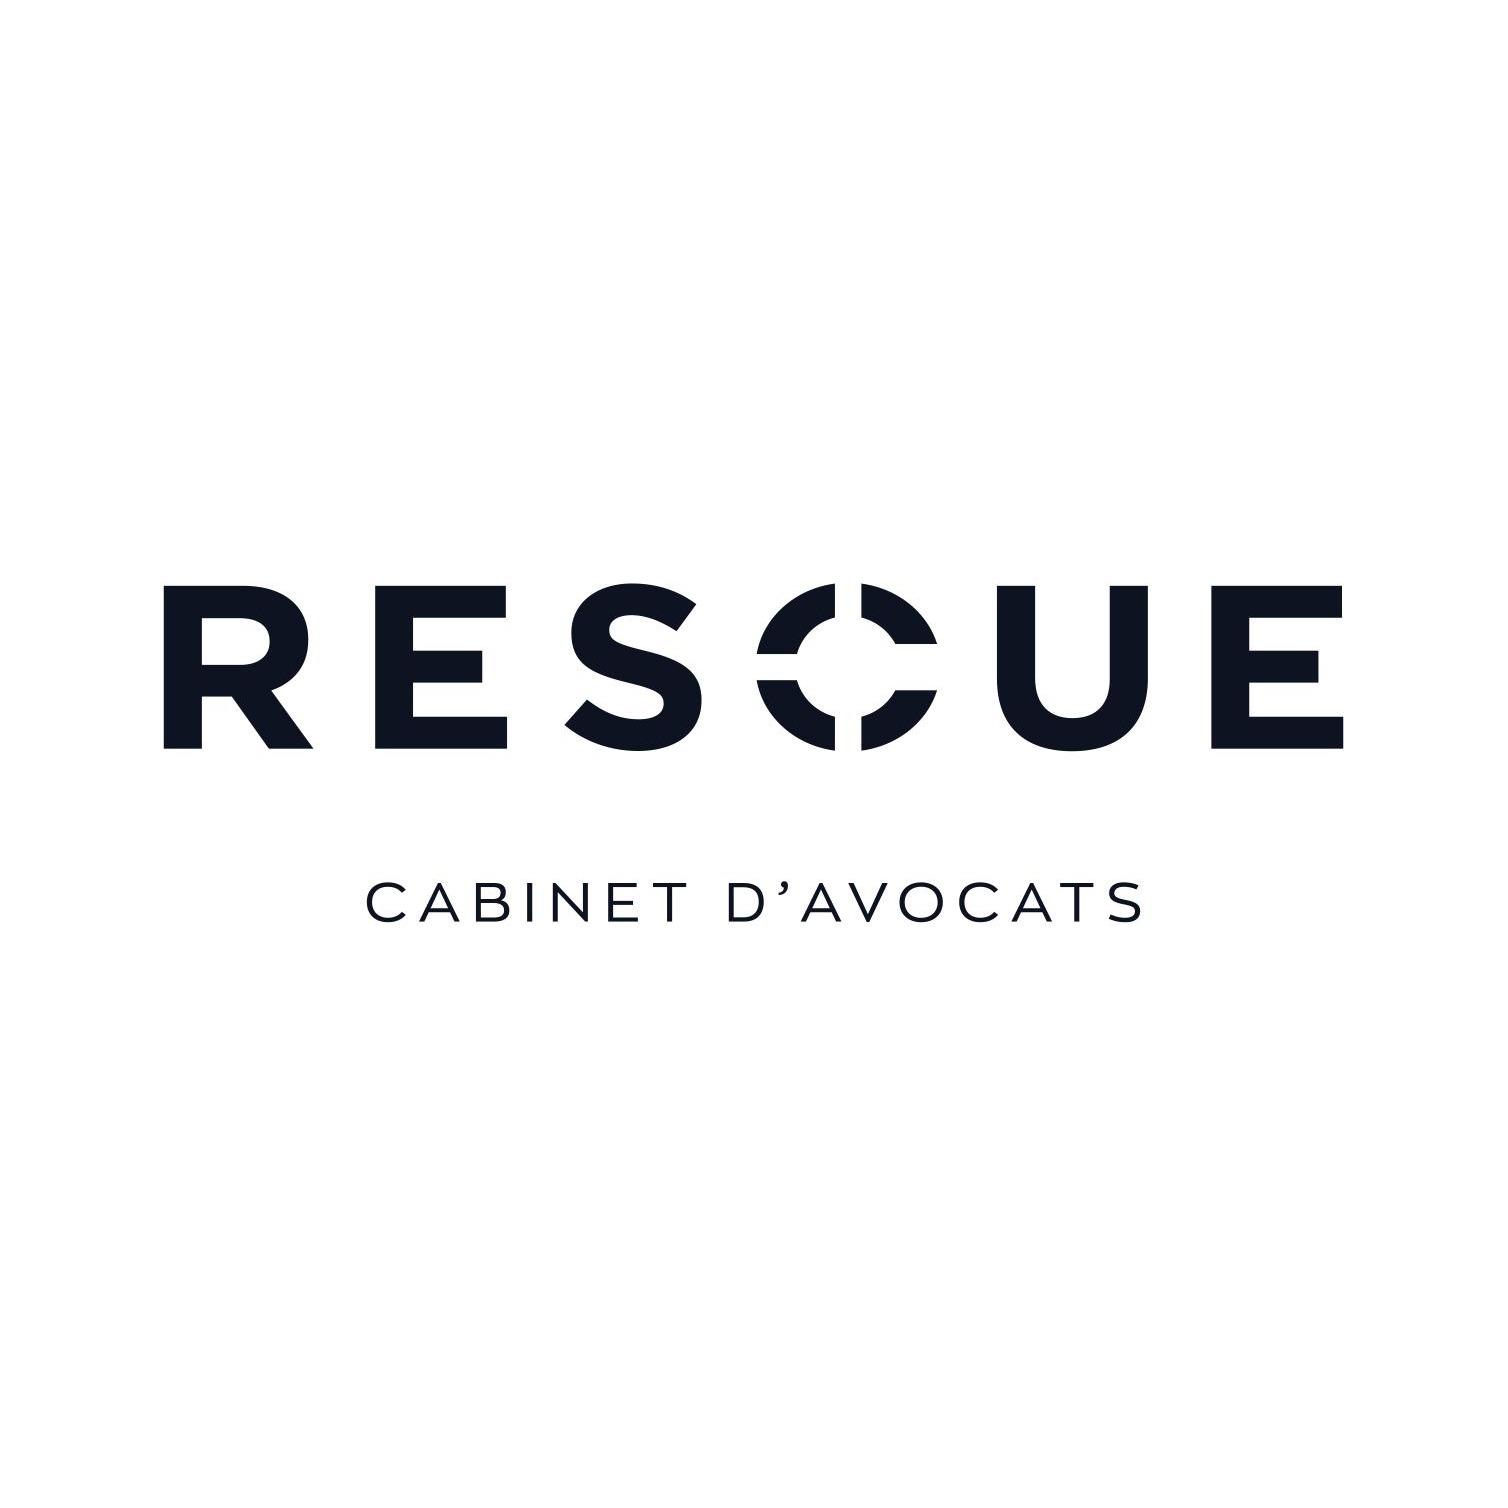 the Rescue logo.